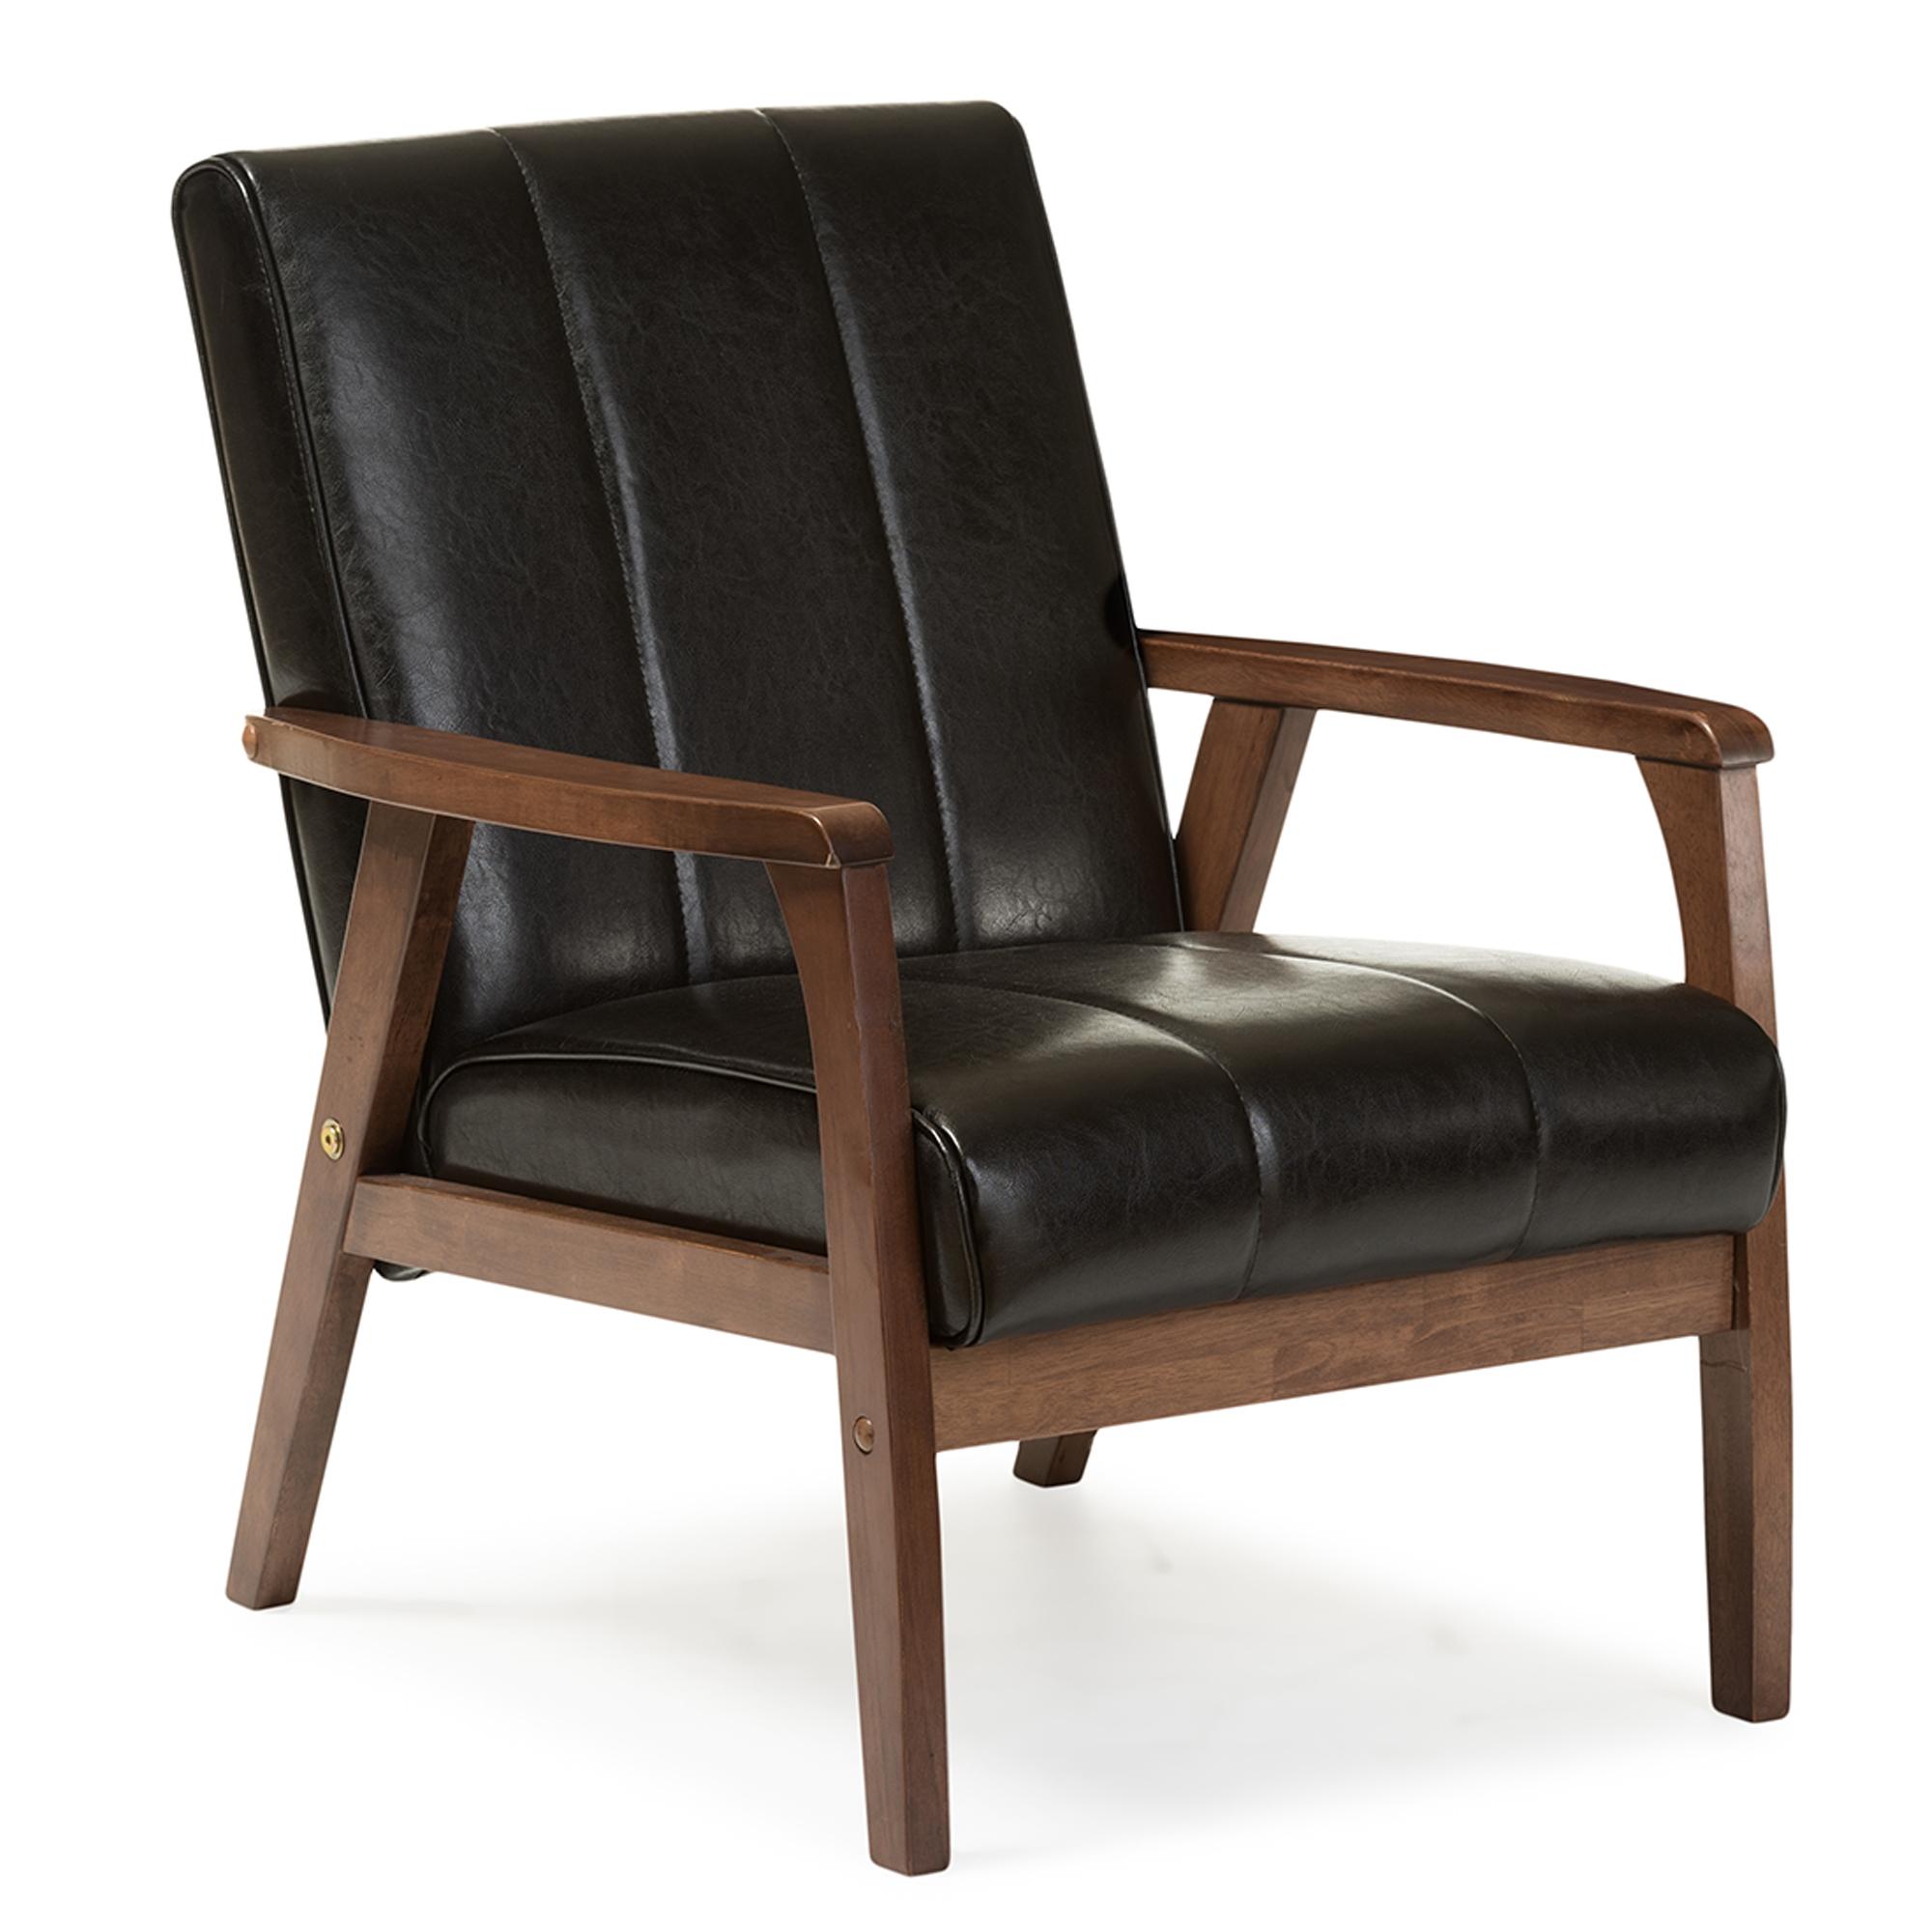 ... Baxton Studio Nikko Mid Century Modern Scandinavian Style Black Faux  Leather Wooden Lounge Chair ...